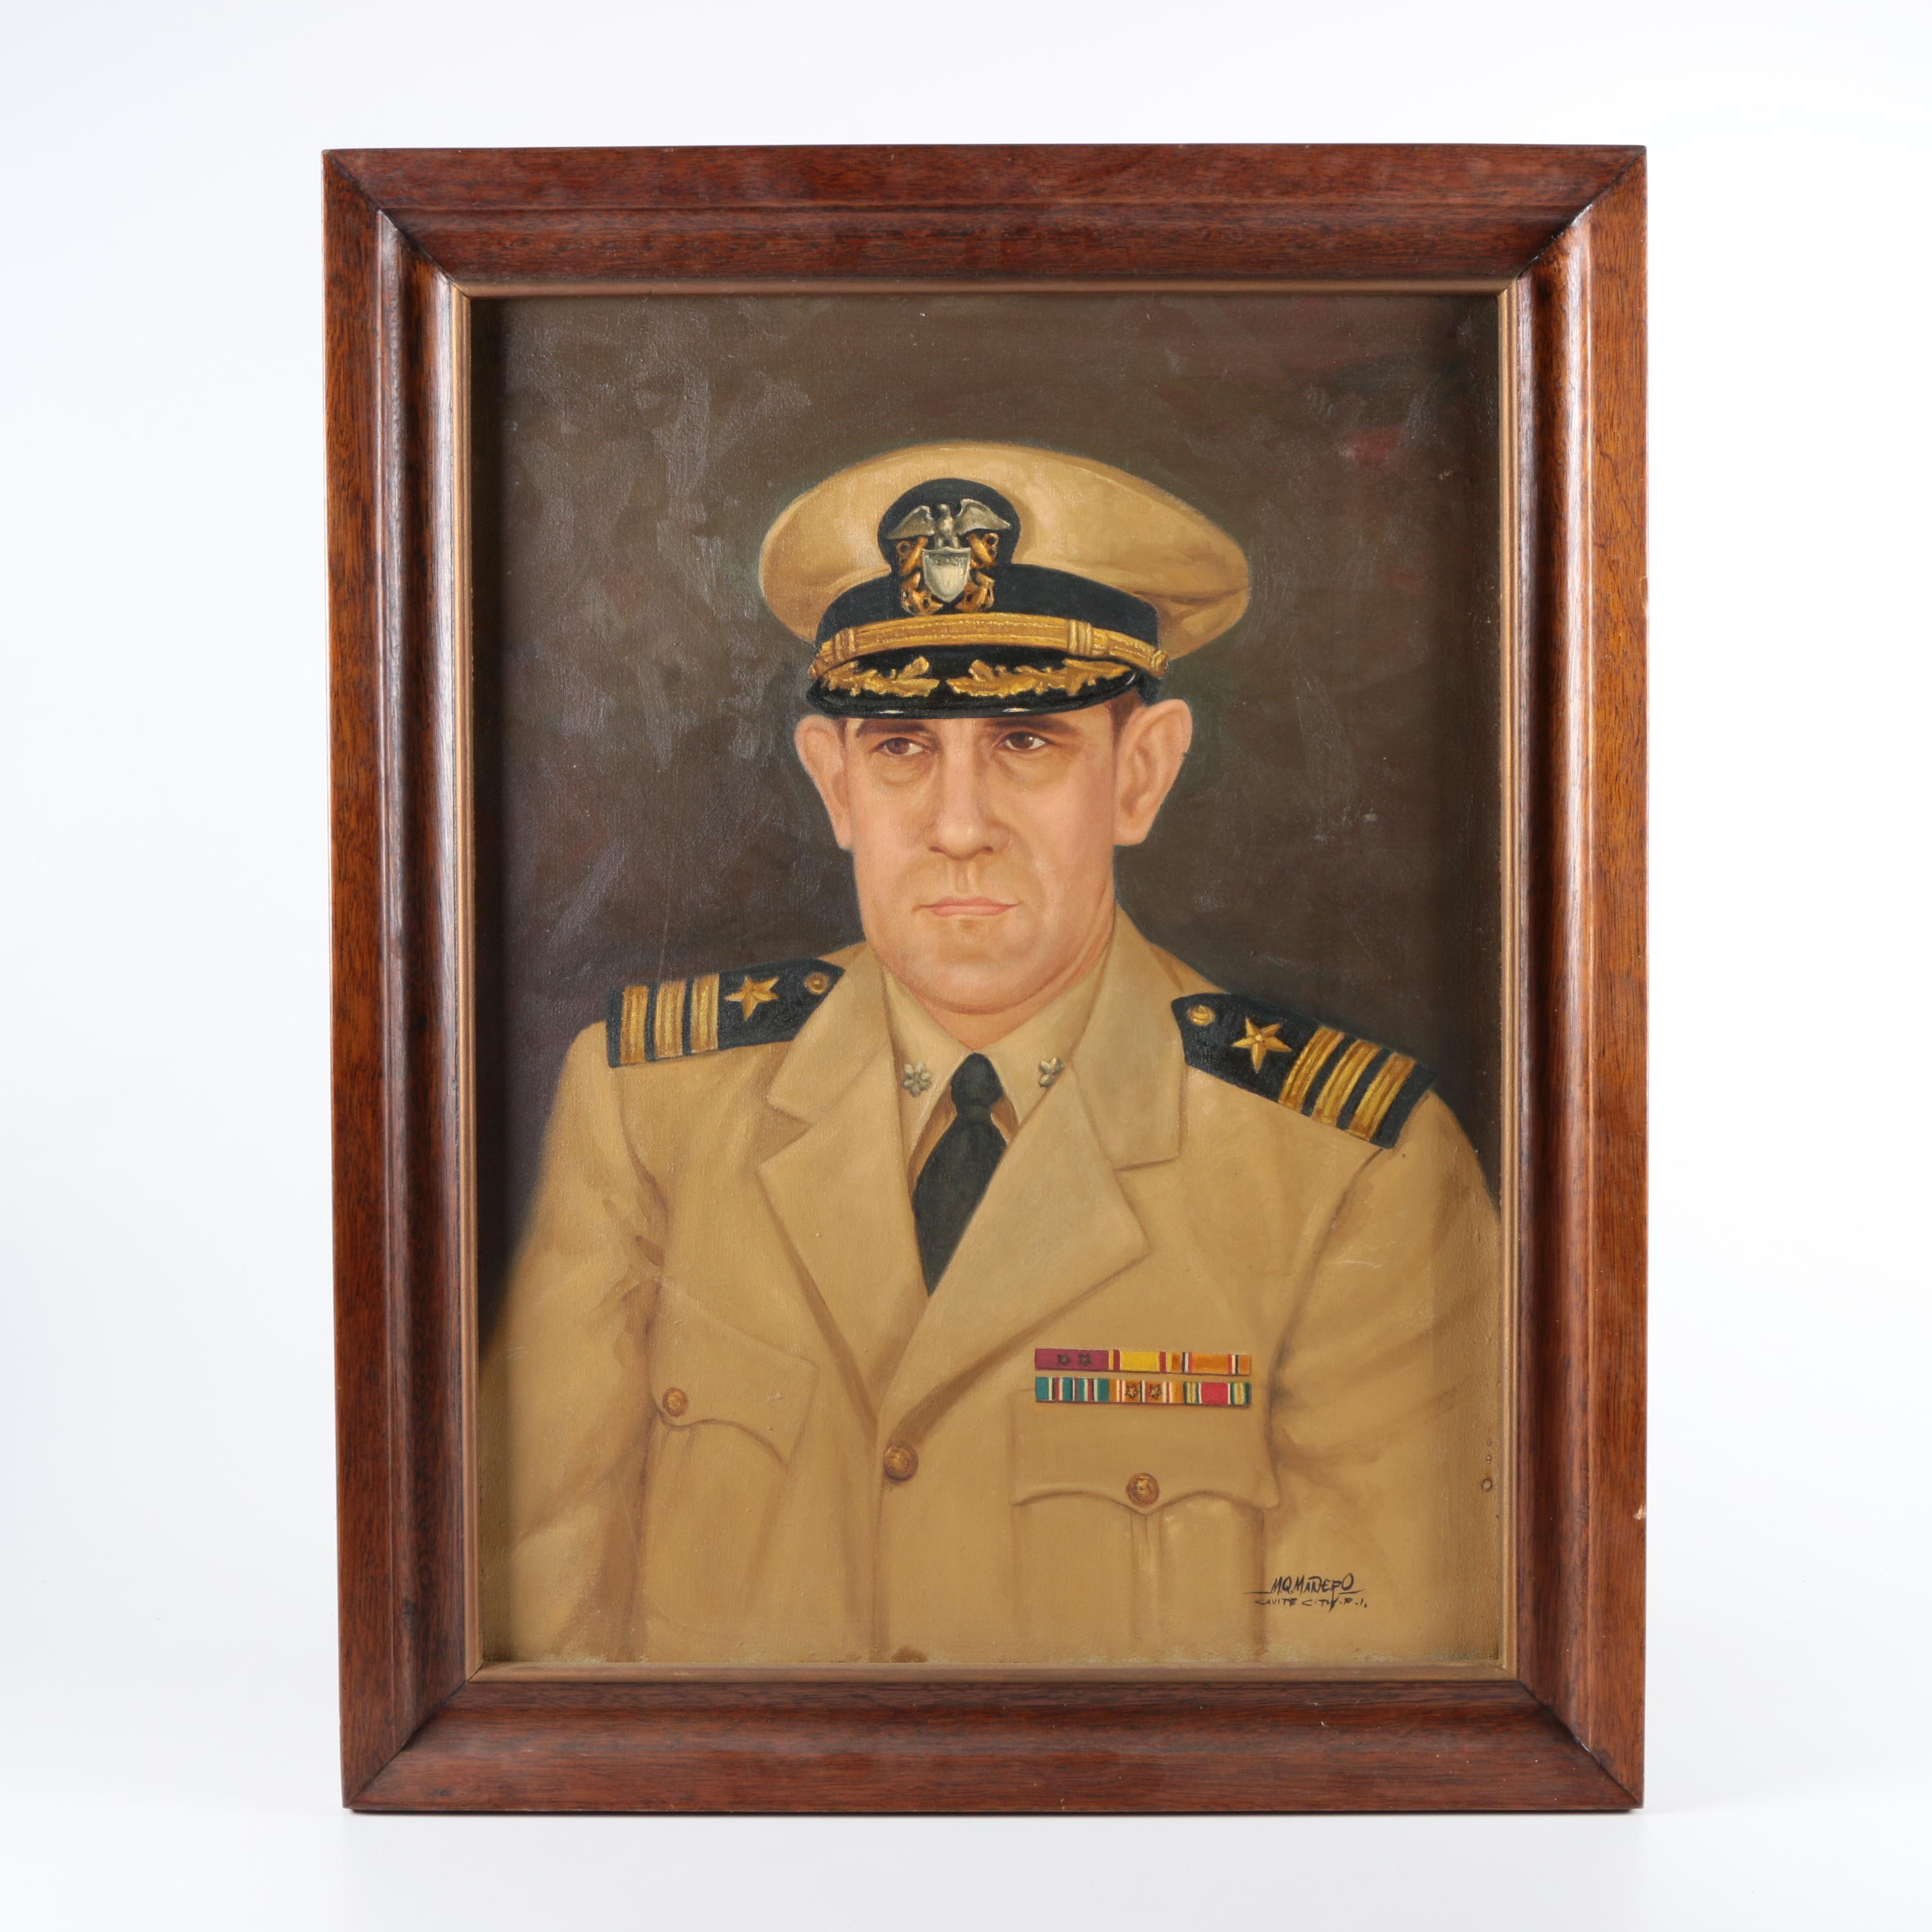 M.Q. Manero Mid Century Oil Portrait on Canvas of U.S. Army General